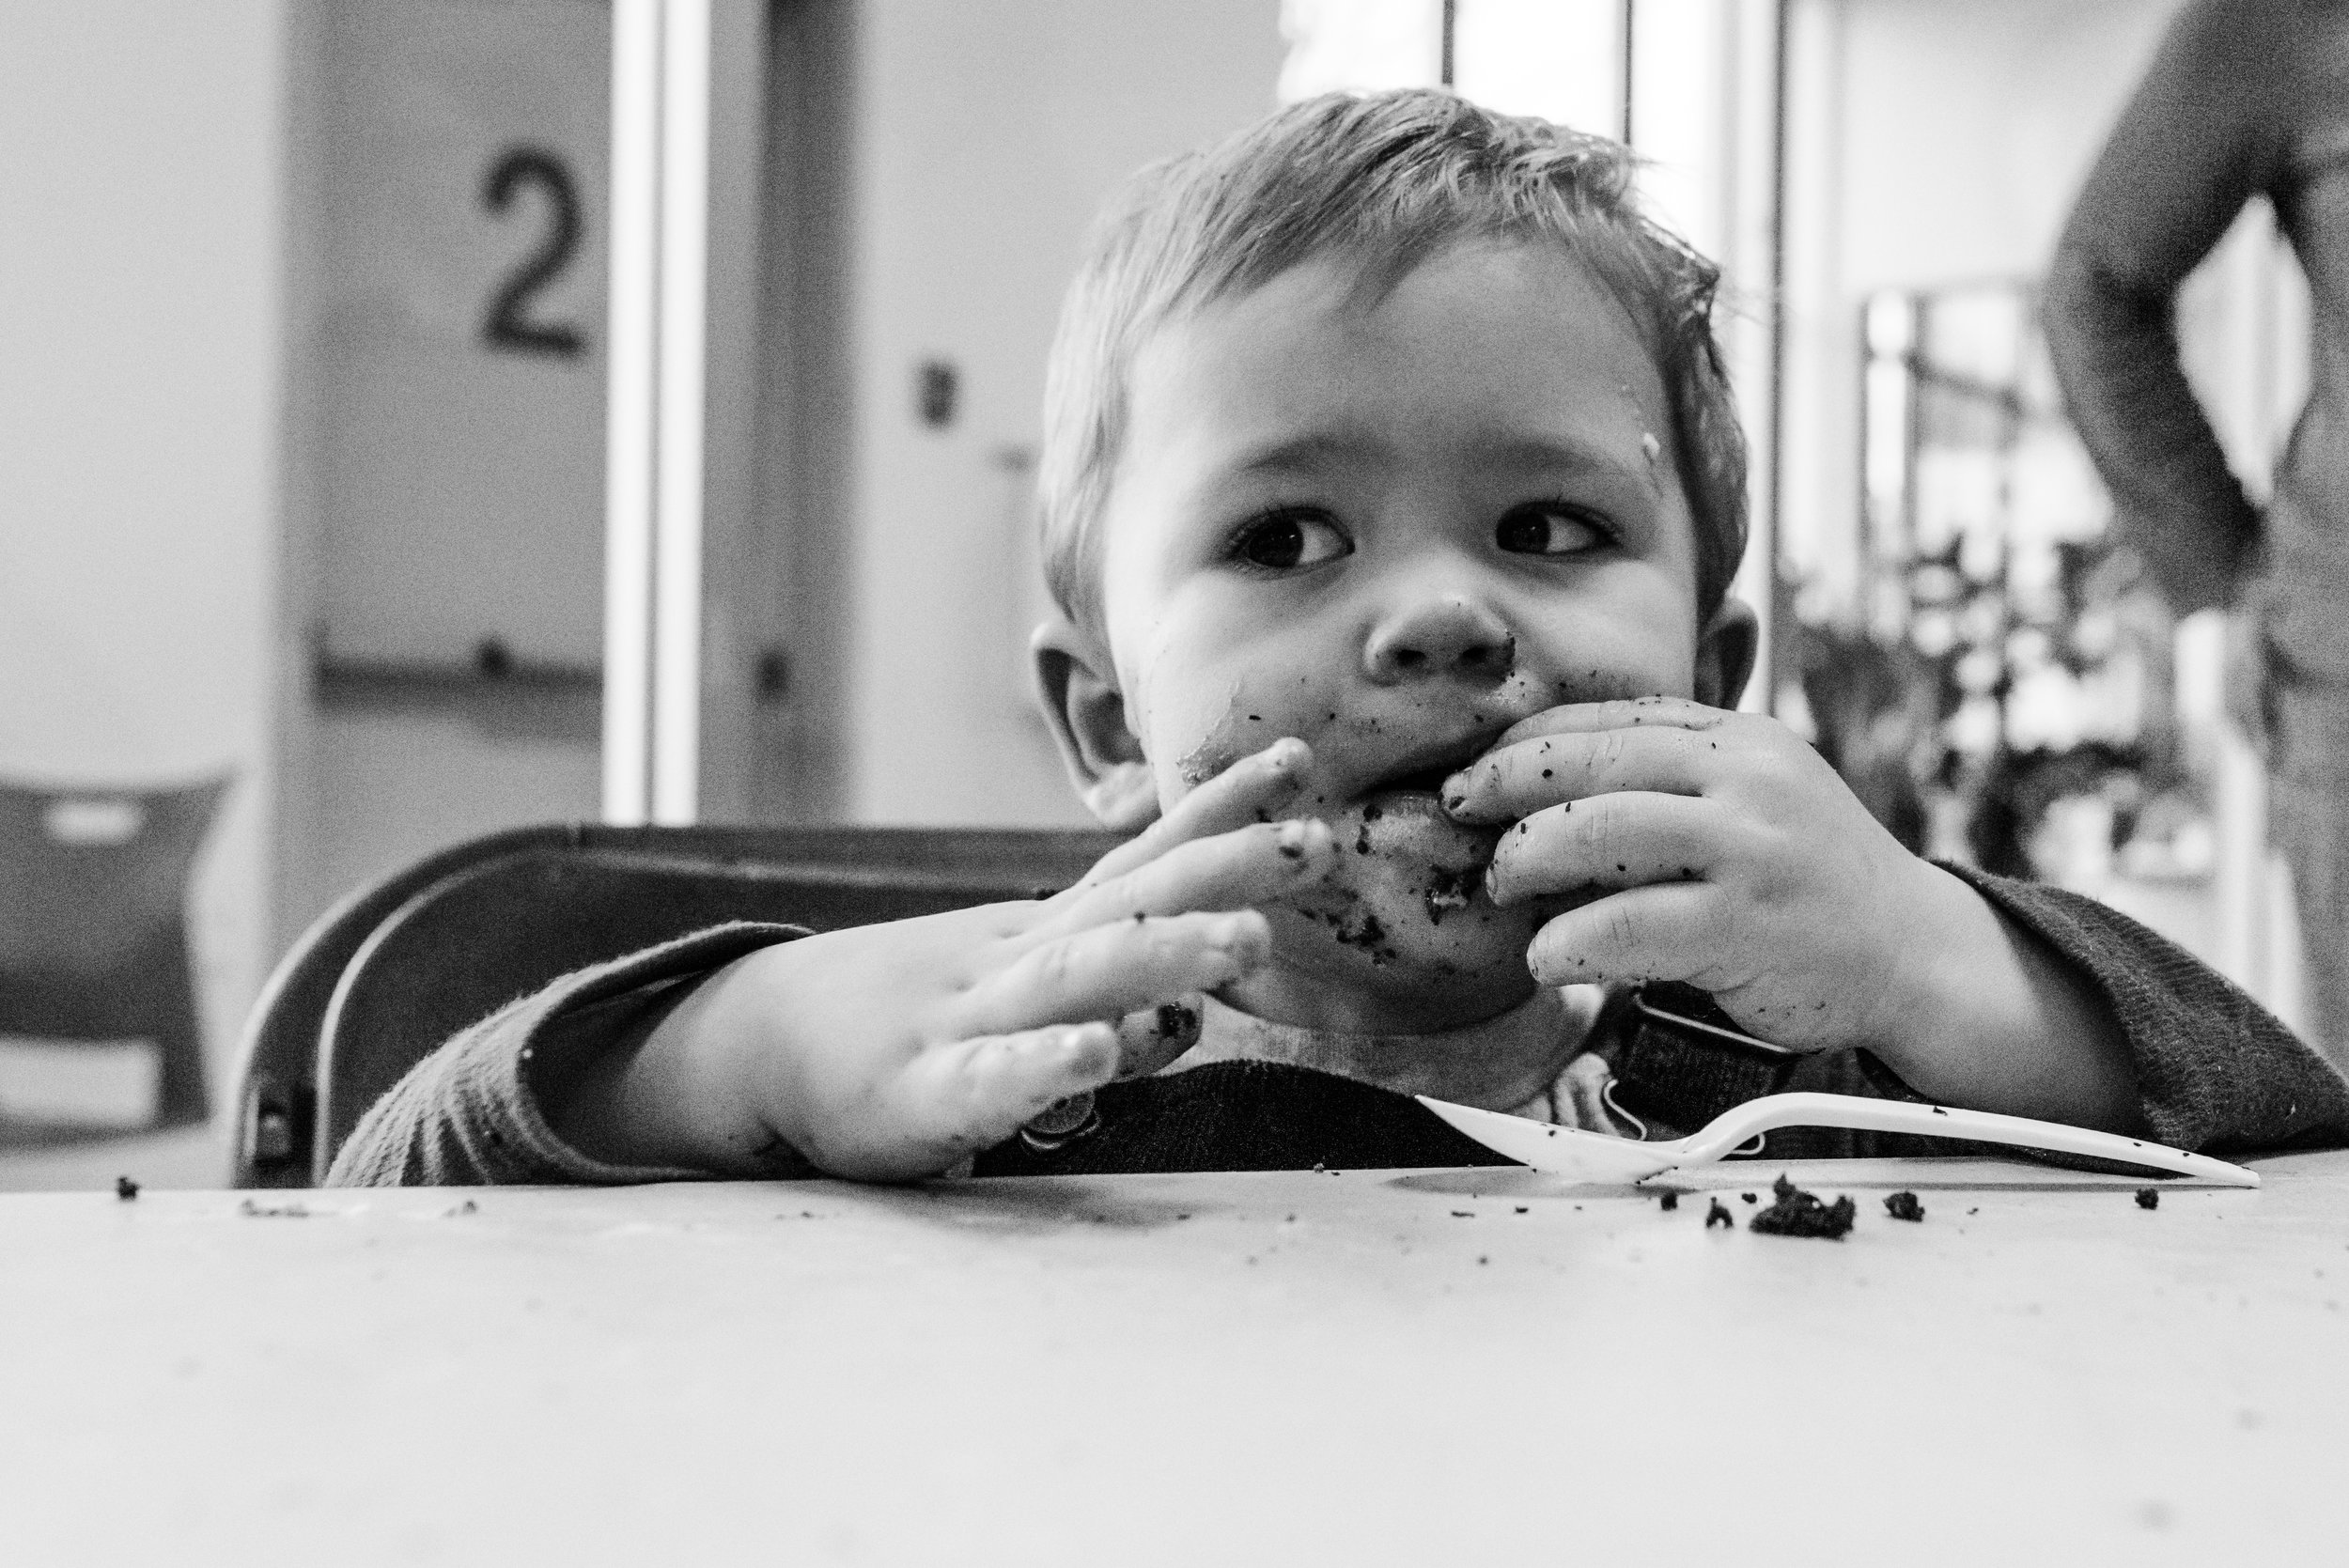 Nicola_Reiersen_Photography_Kids_Birthday_Pool_Party (58).jpg